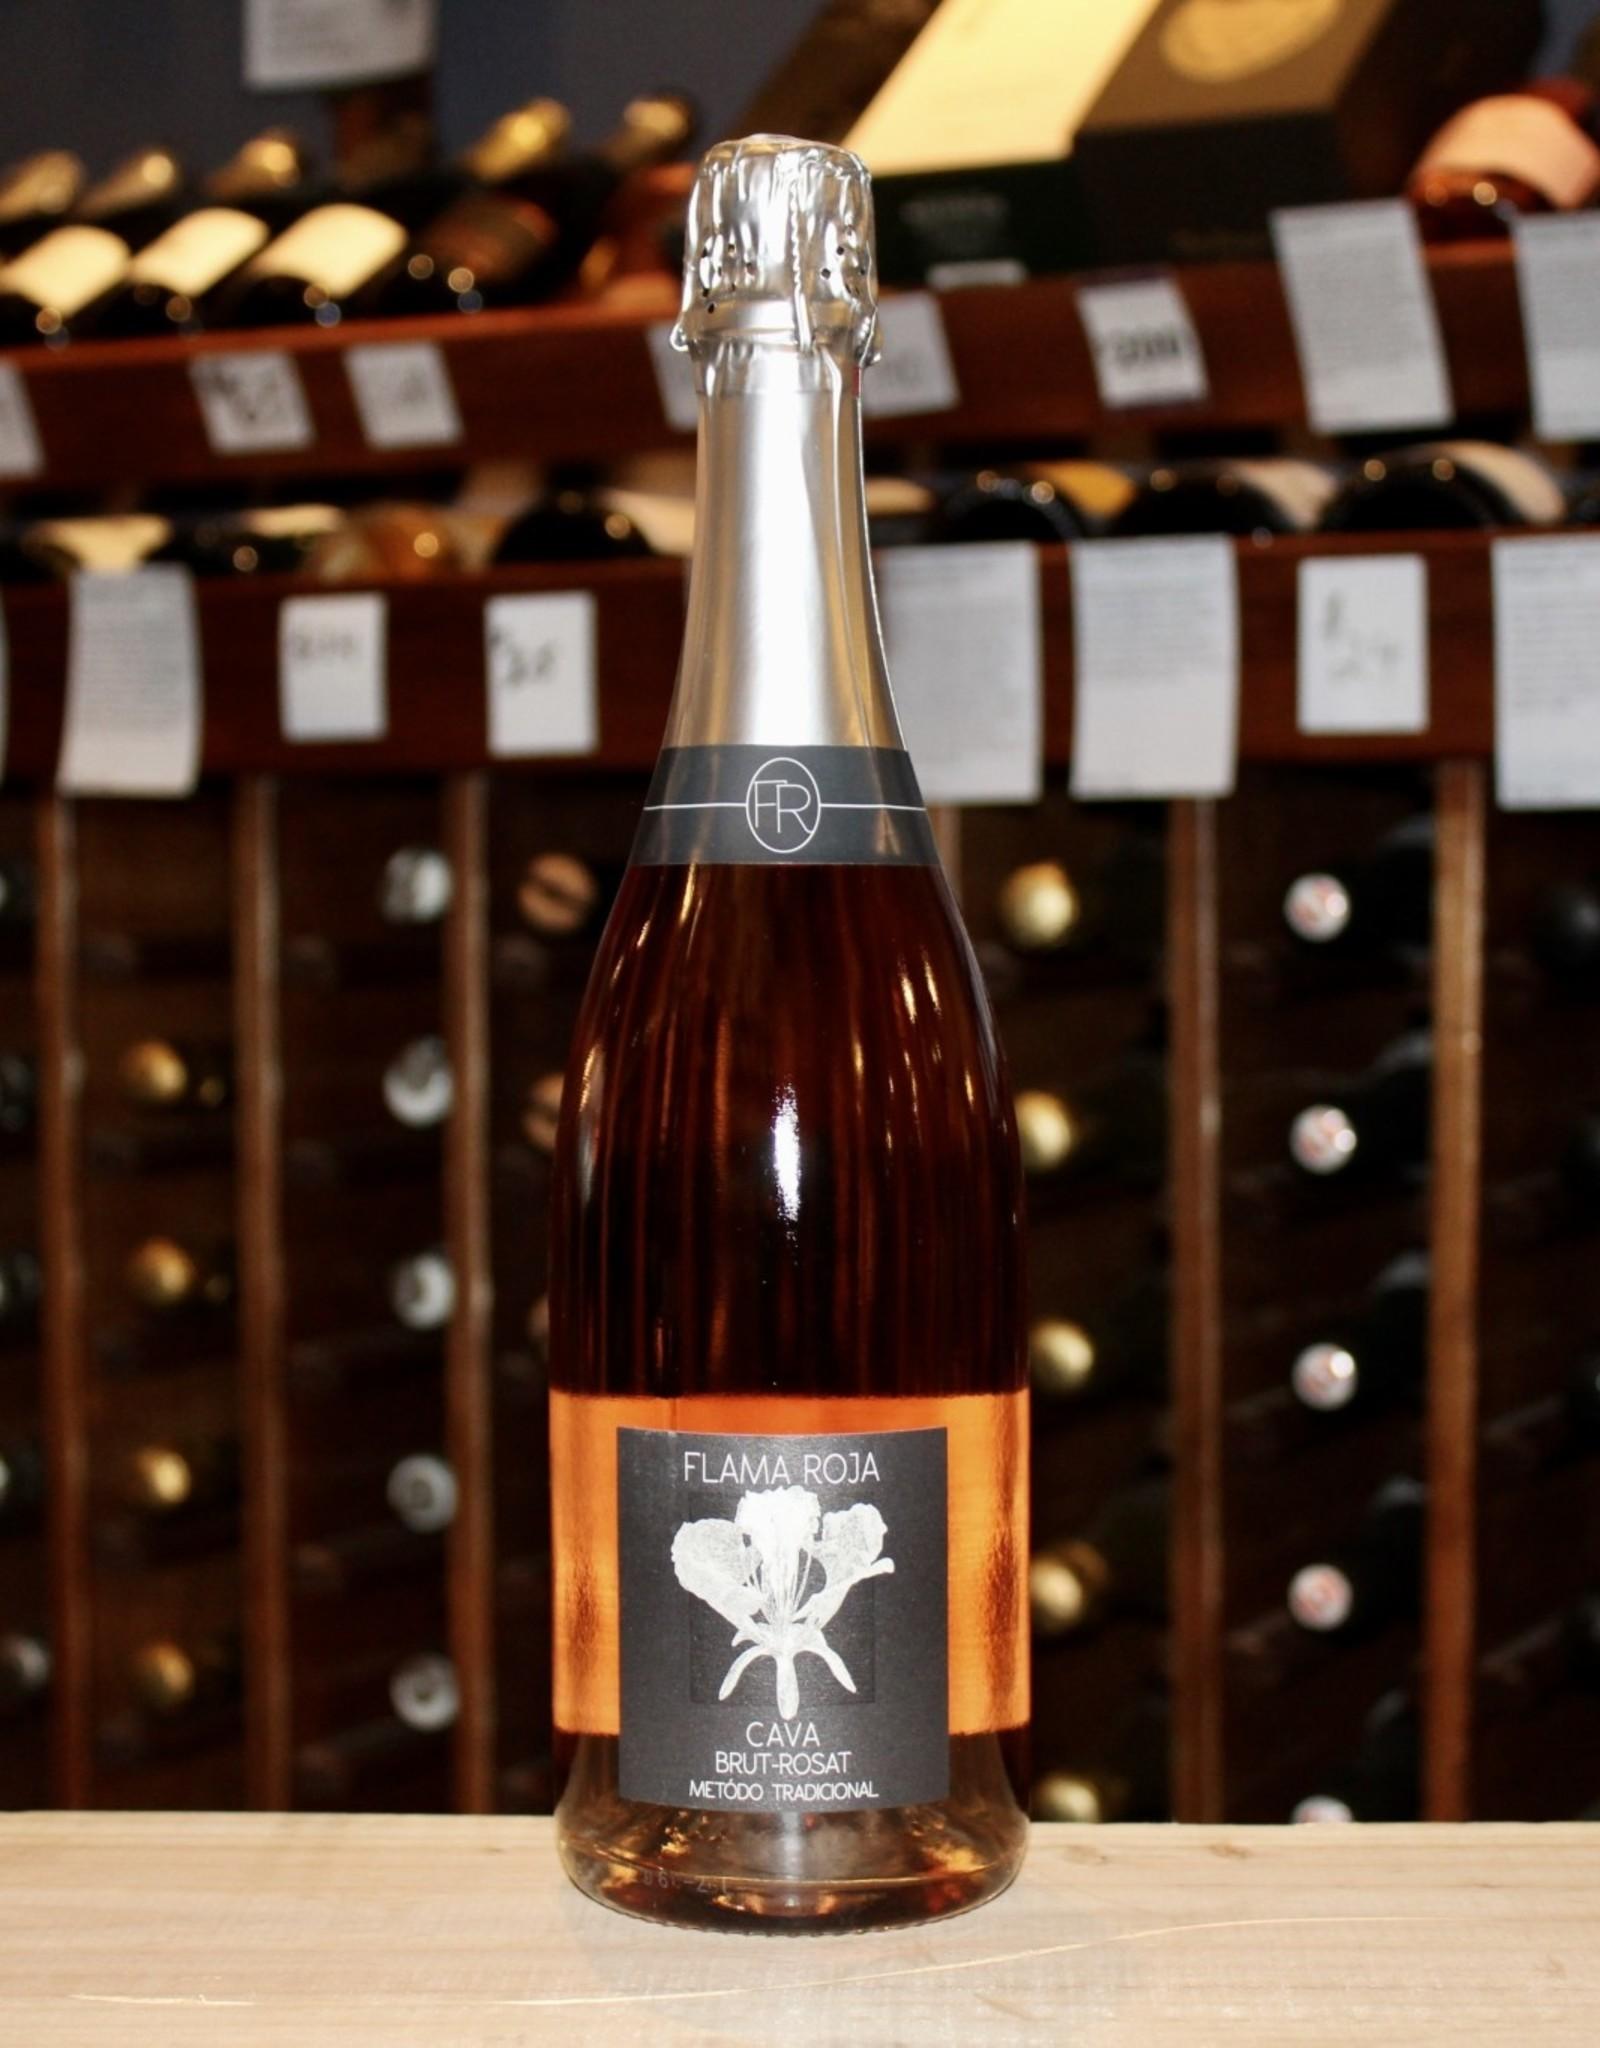 Wine NV Flama Roja Brut Rose Cava - Catalonia, Spain (750ml)